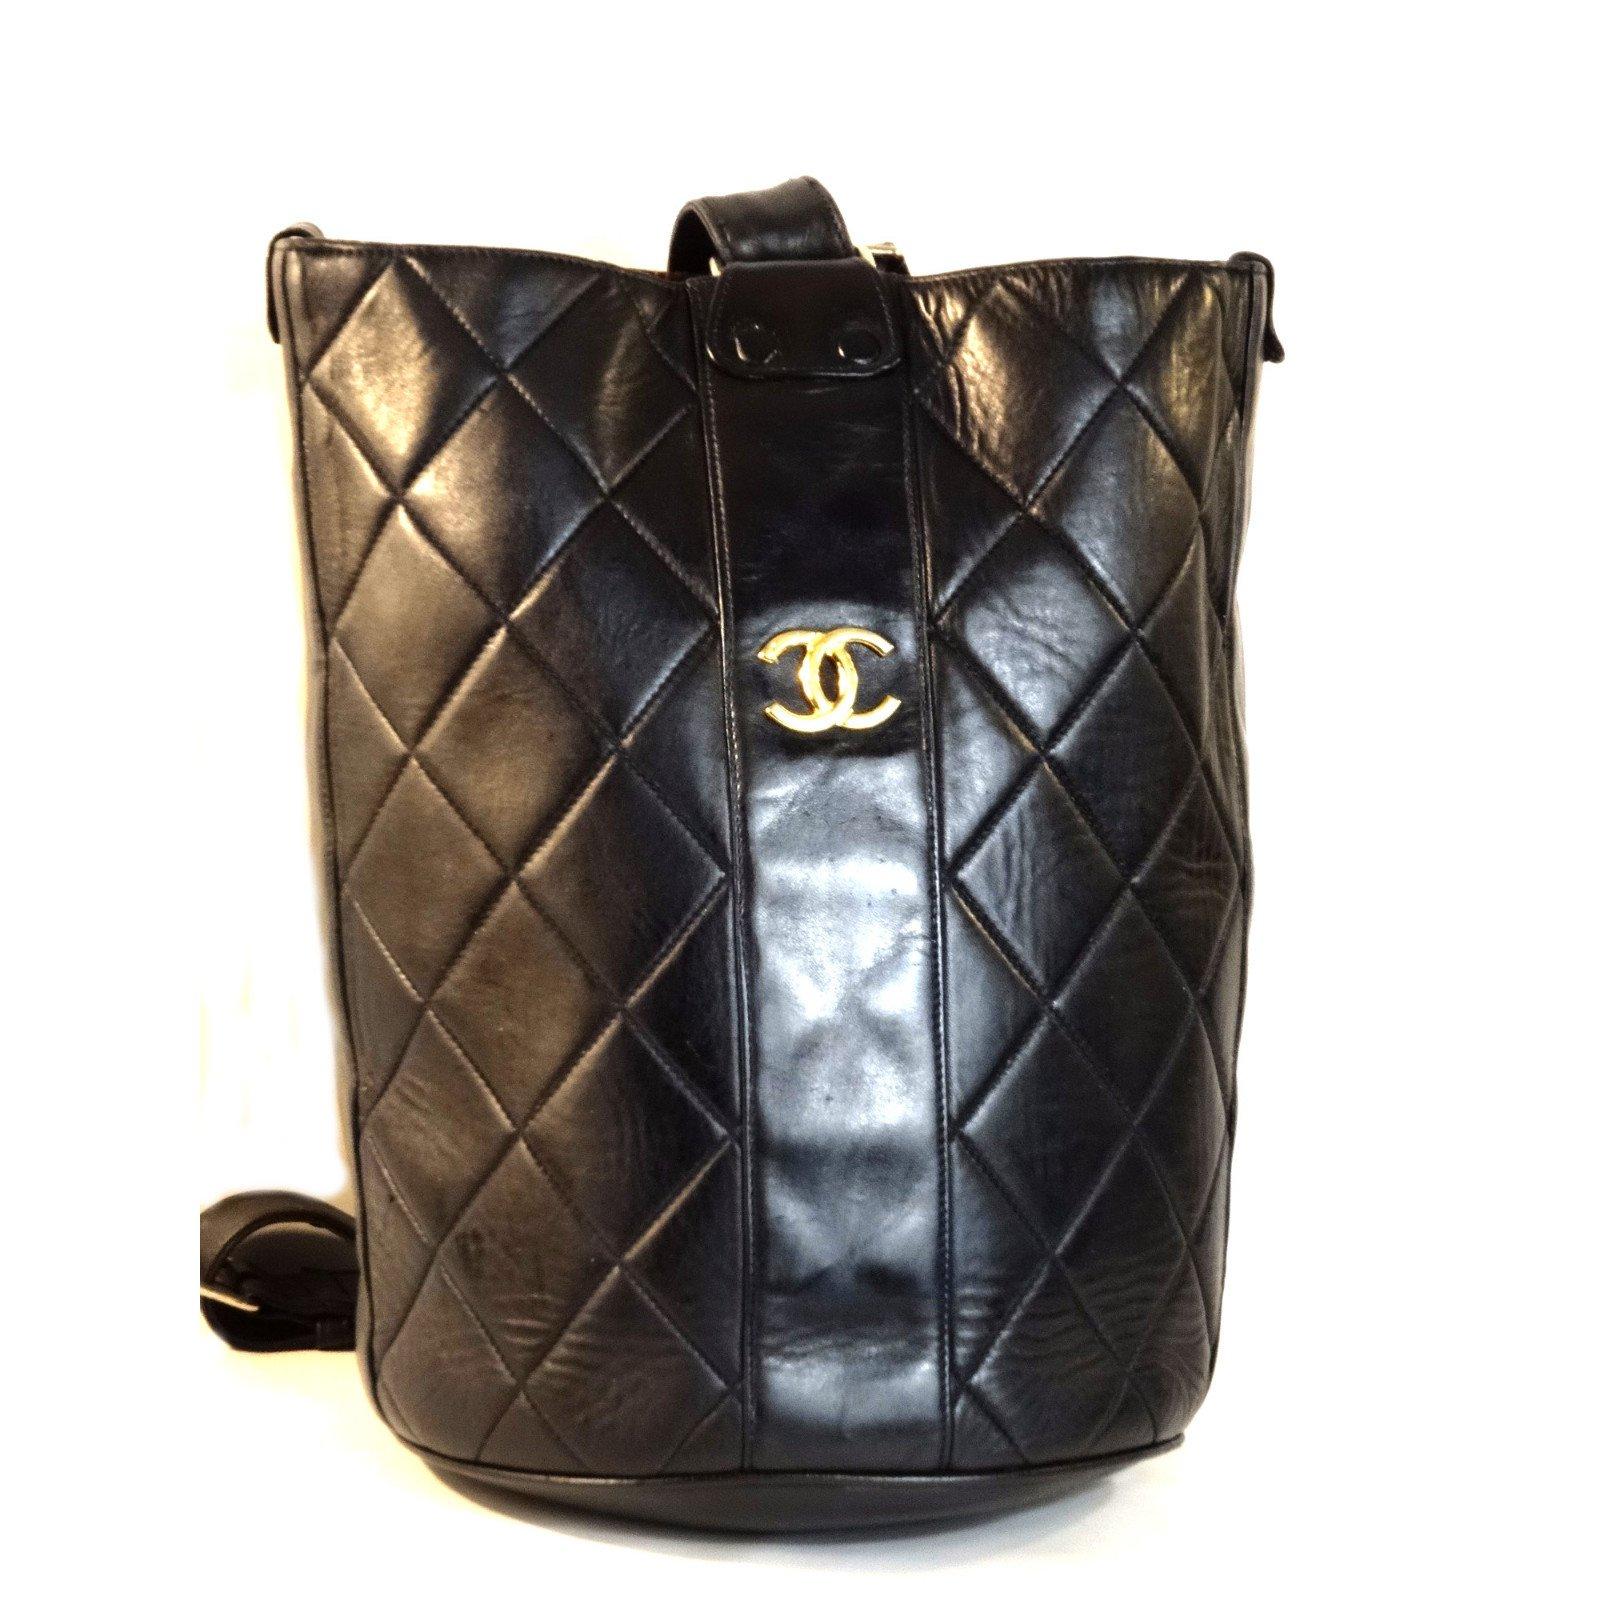 939db3a21f97 Chanel Backpack Backpacks Leather Black ref.39512 - Joli Closet